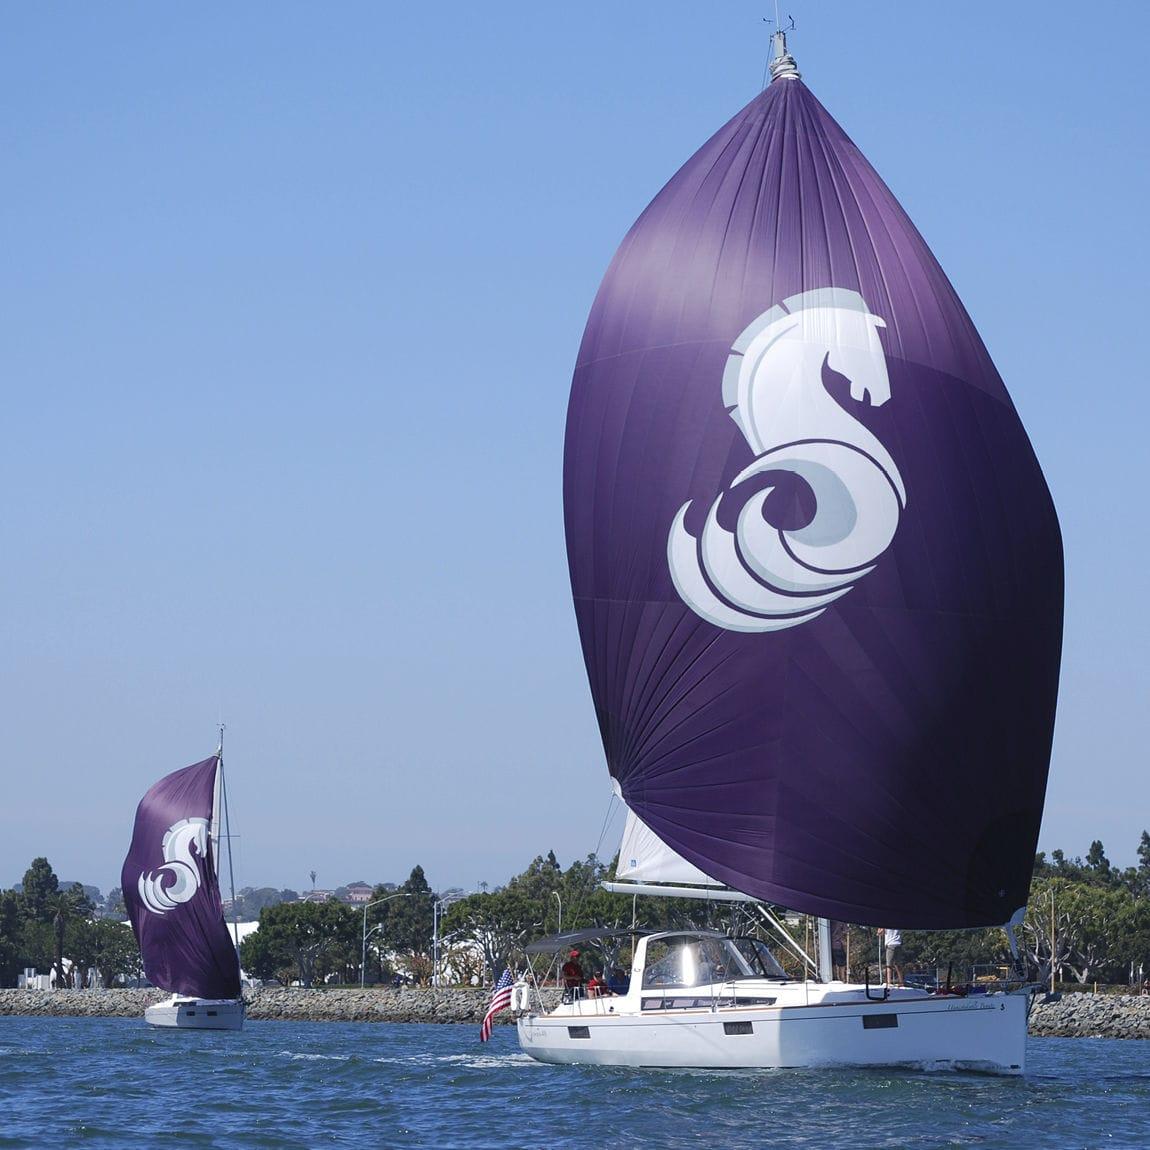 Asymmetric spinnaker / for cruising sailboats / tri-radial cut